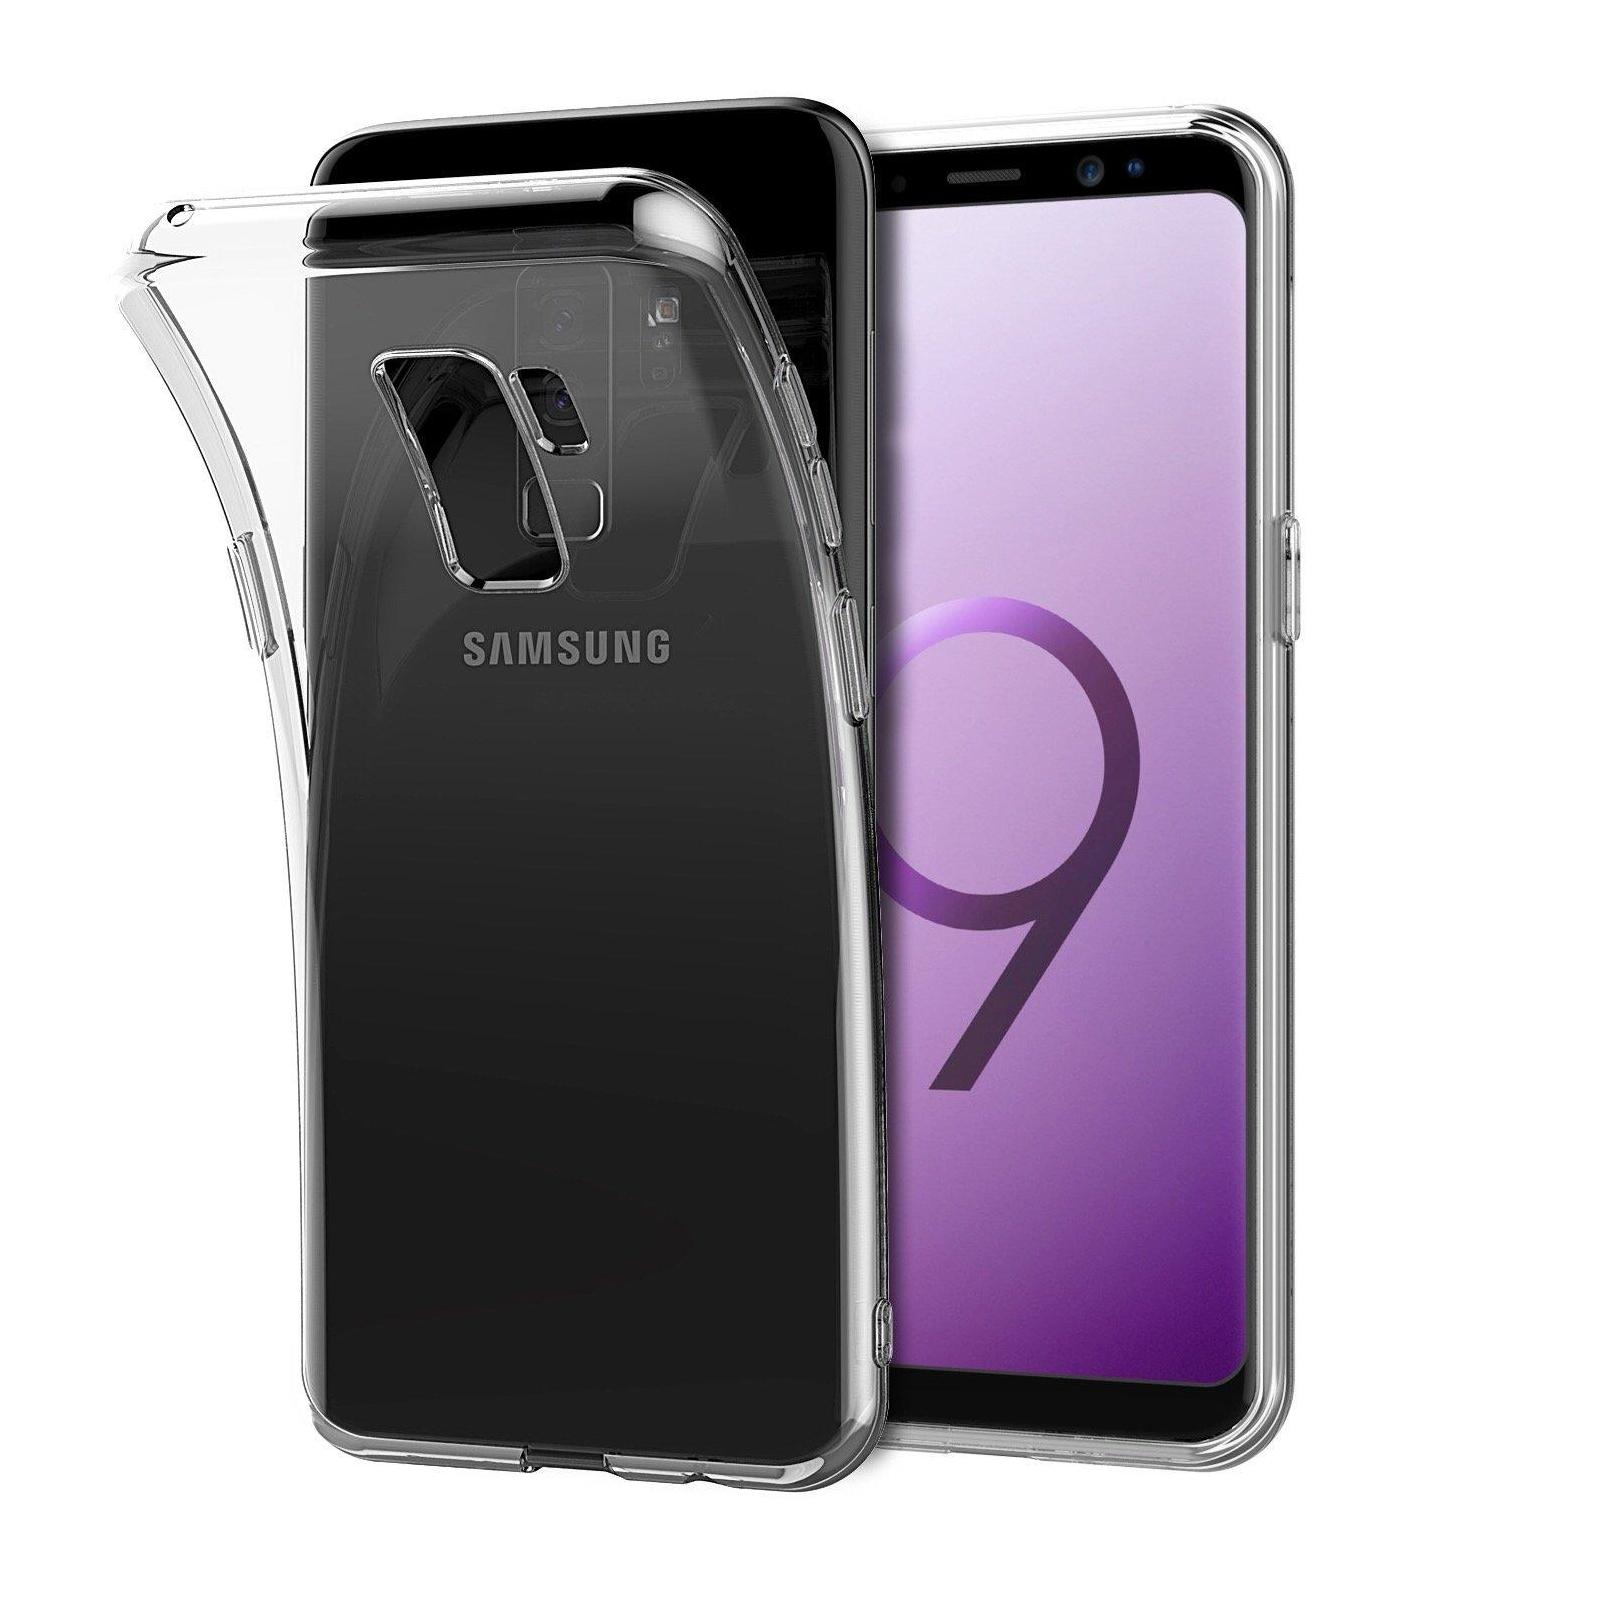 Чехол для моб. телефона Laudtec для SAMSUNG Galaxy S9 Plus Clear tpu (Transperent) (LC-GS9PB)